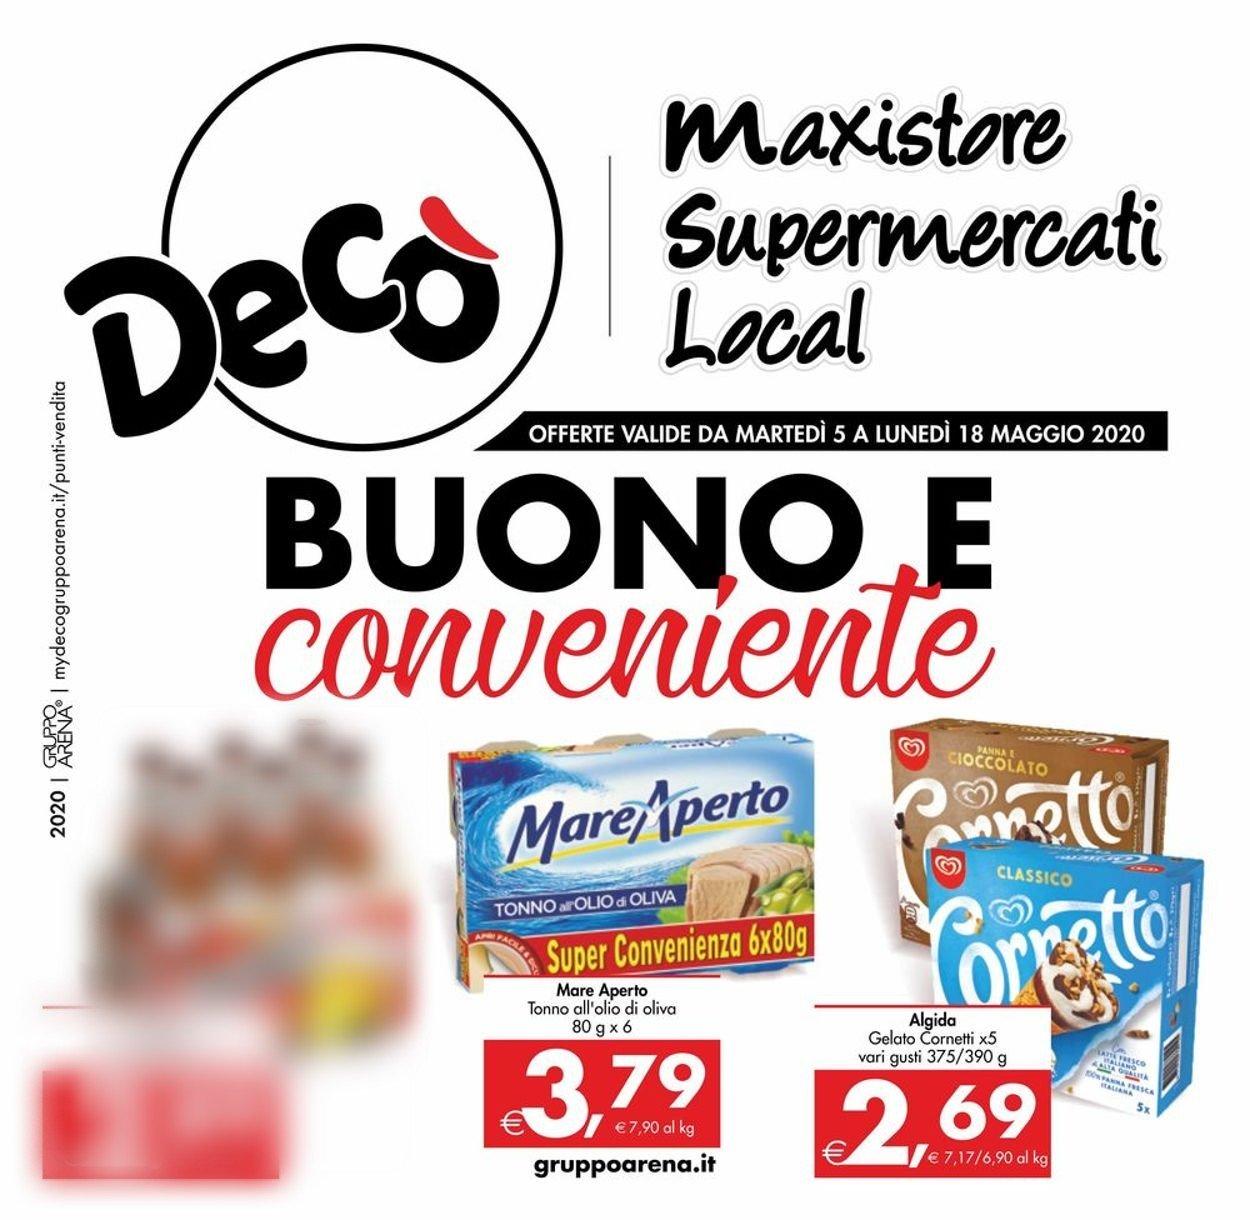 Volantino Deco - Offerte 05/05-18/05/2020